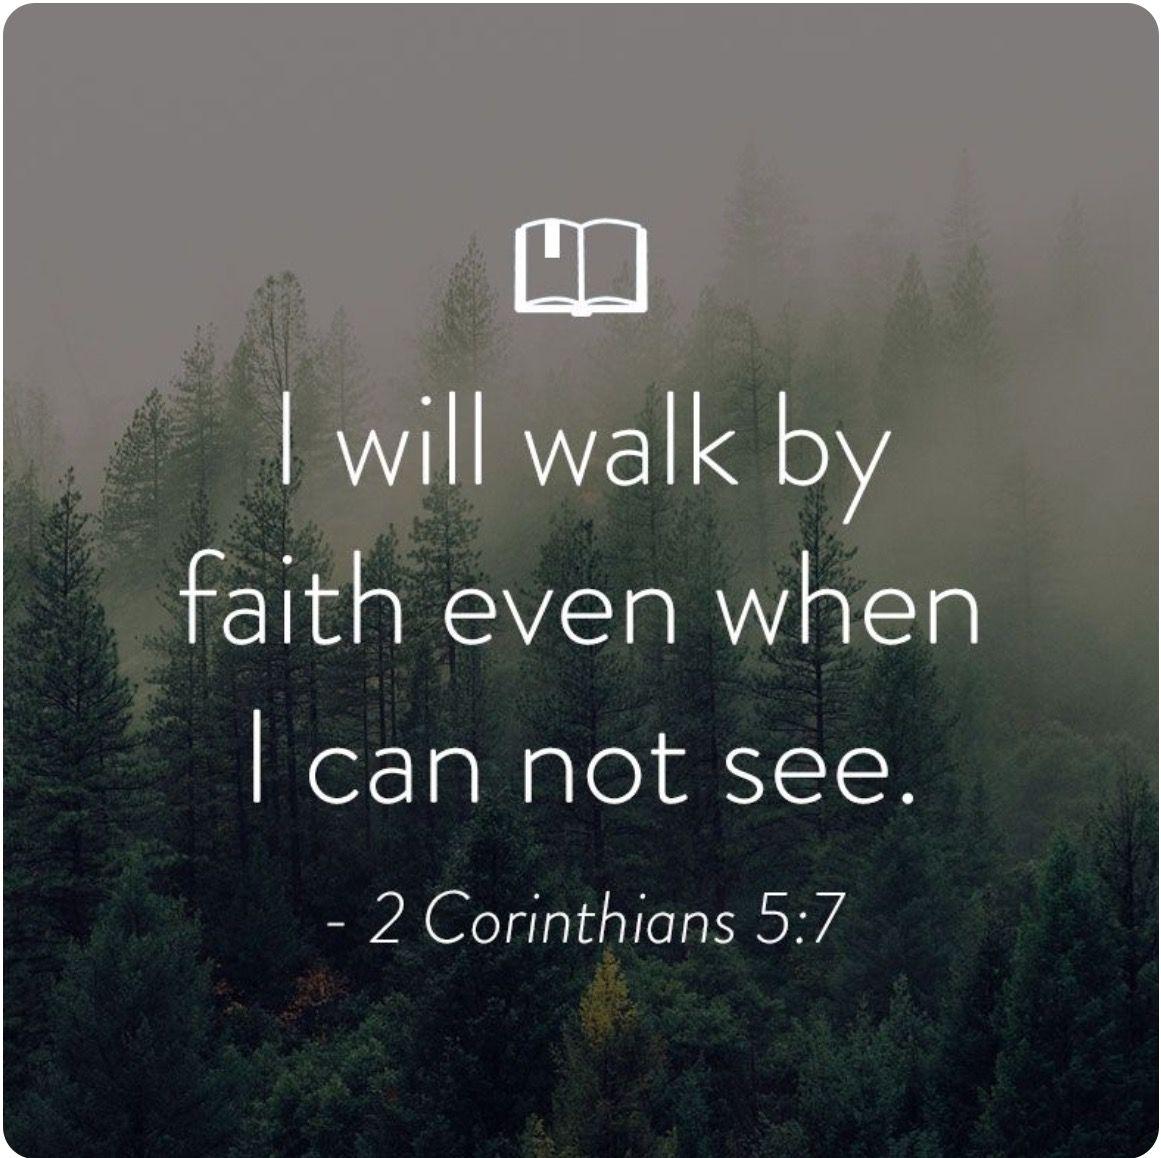 Bible Quotes For Strength Pinmegan Middleton On *1 & 2 Corinthians*  Pinterest  Bible